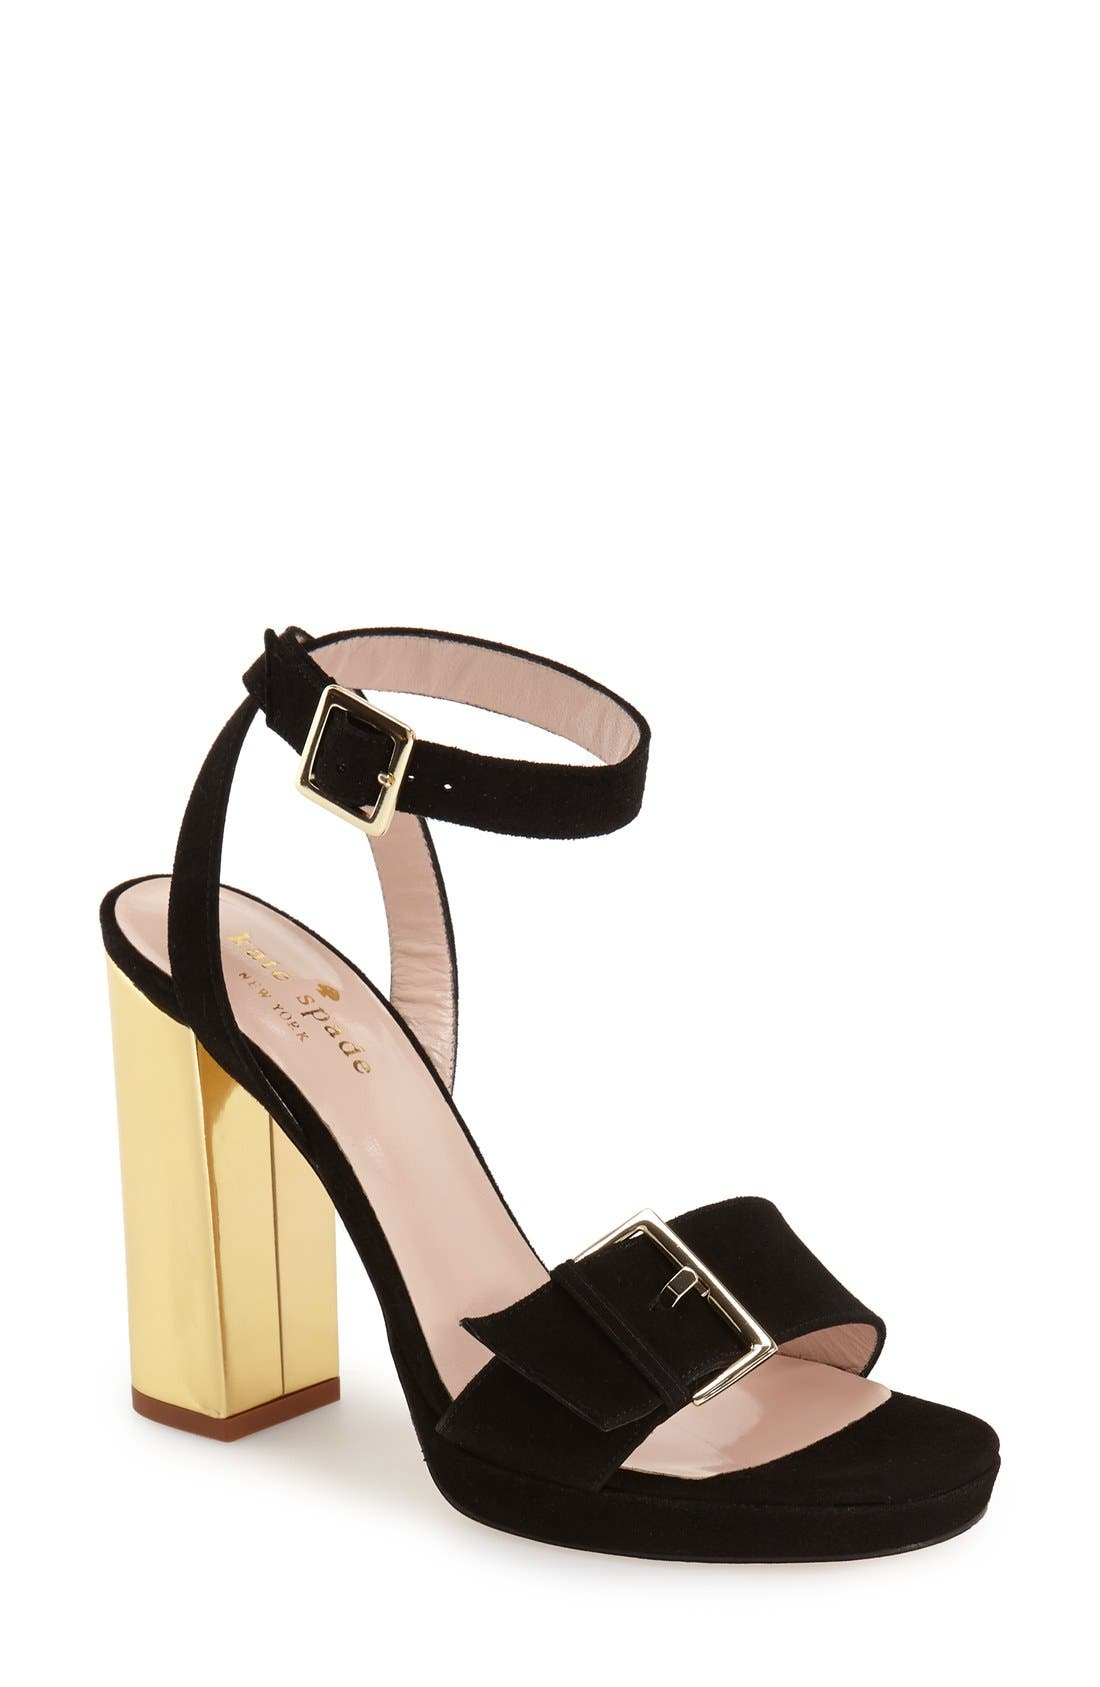 Alternate Image 1 Selected - kate spade new york 'breeze' sandal (Women)